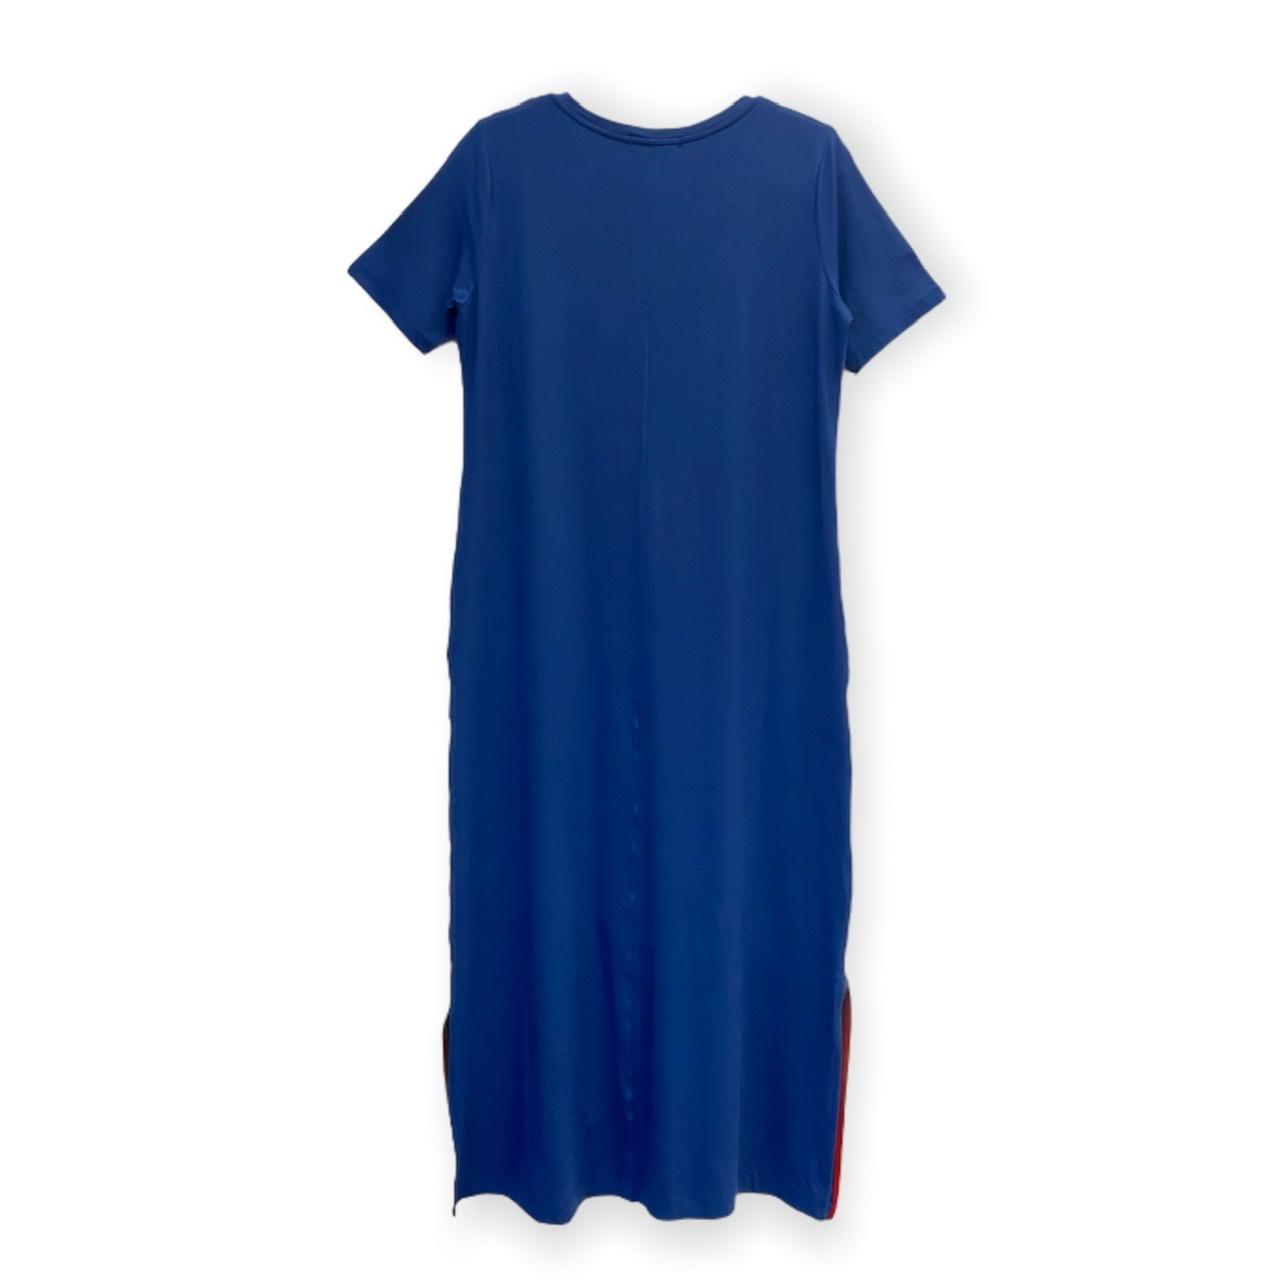 Vestido decote V azul royal